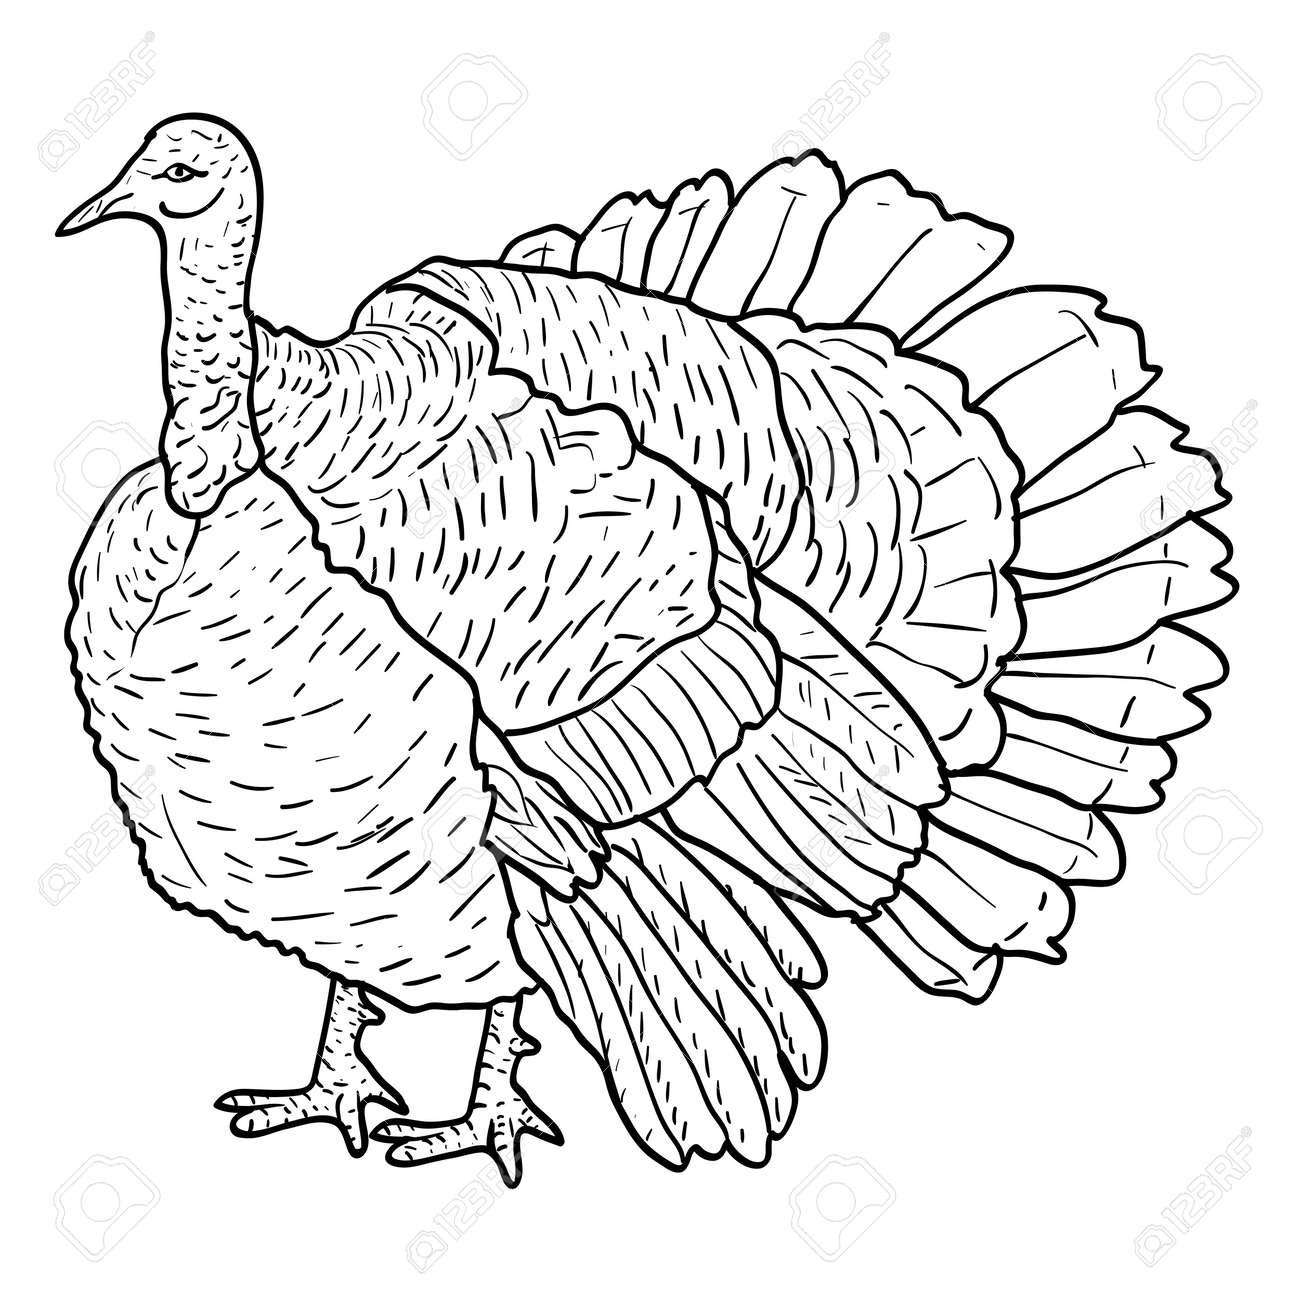 sketch black turkey on a white background vector illustration